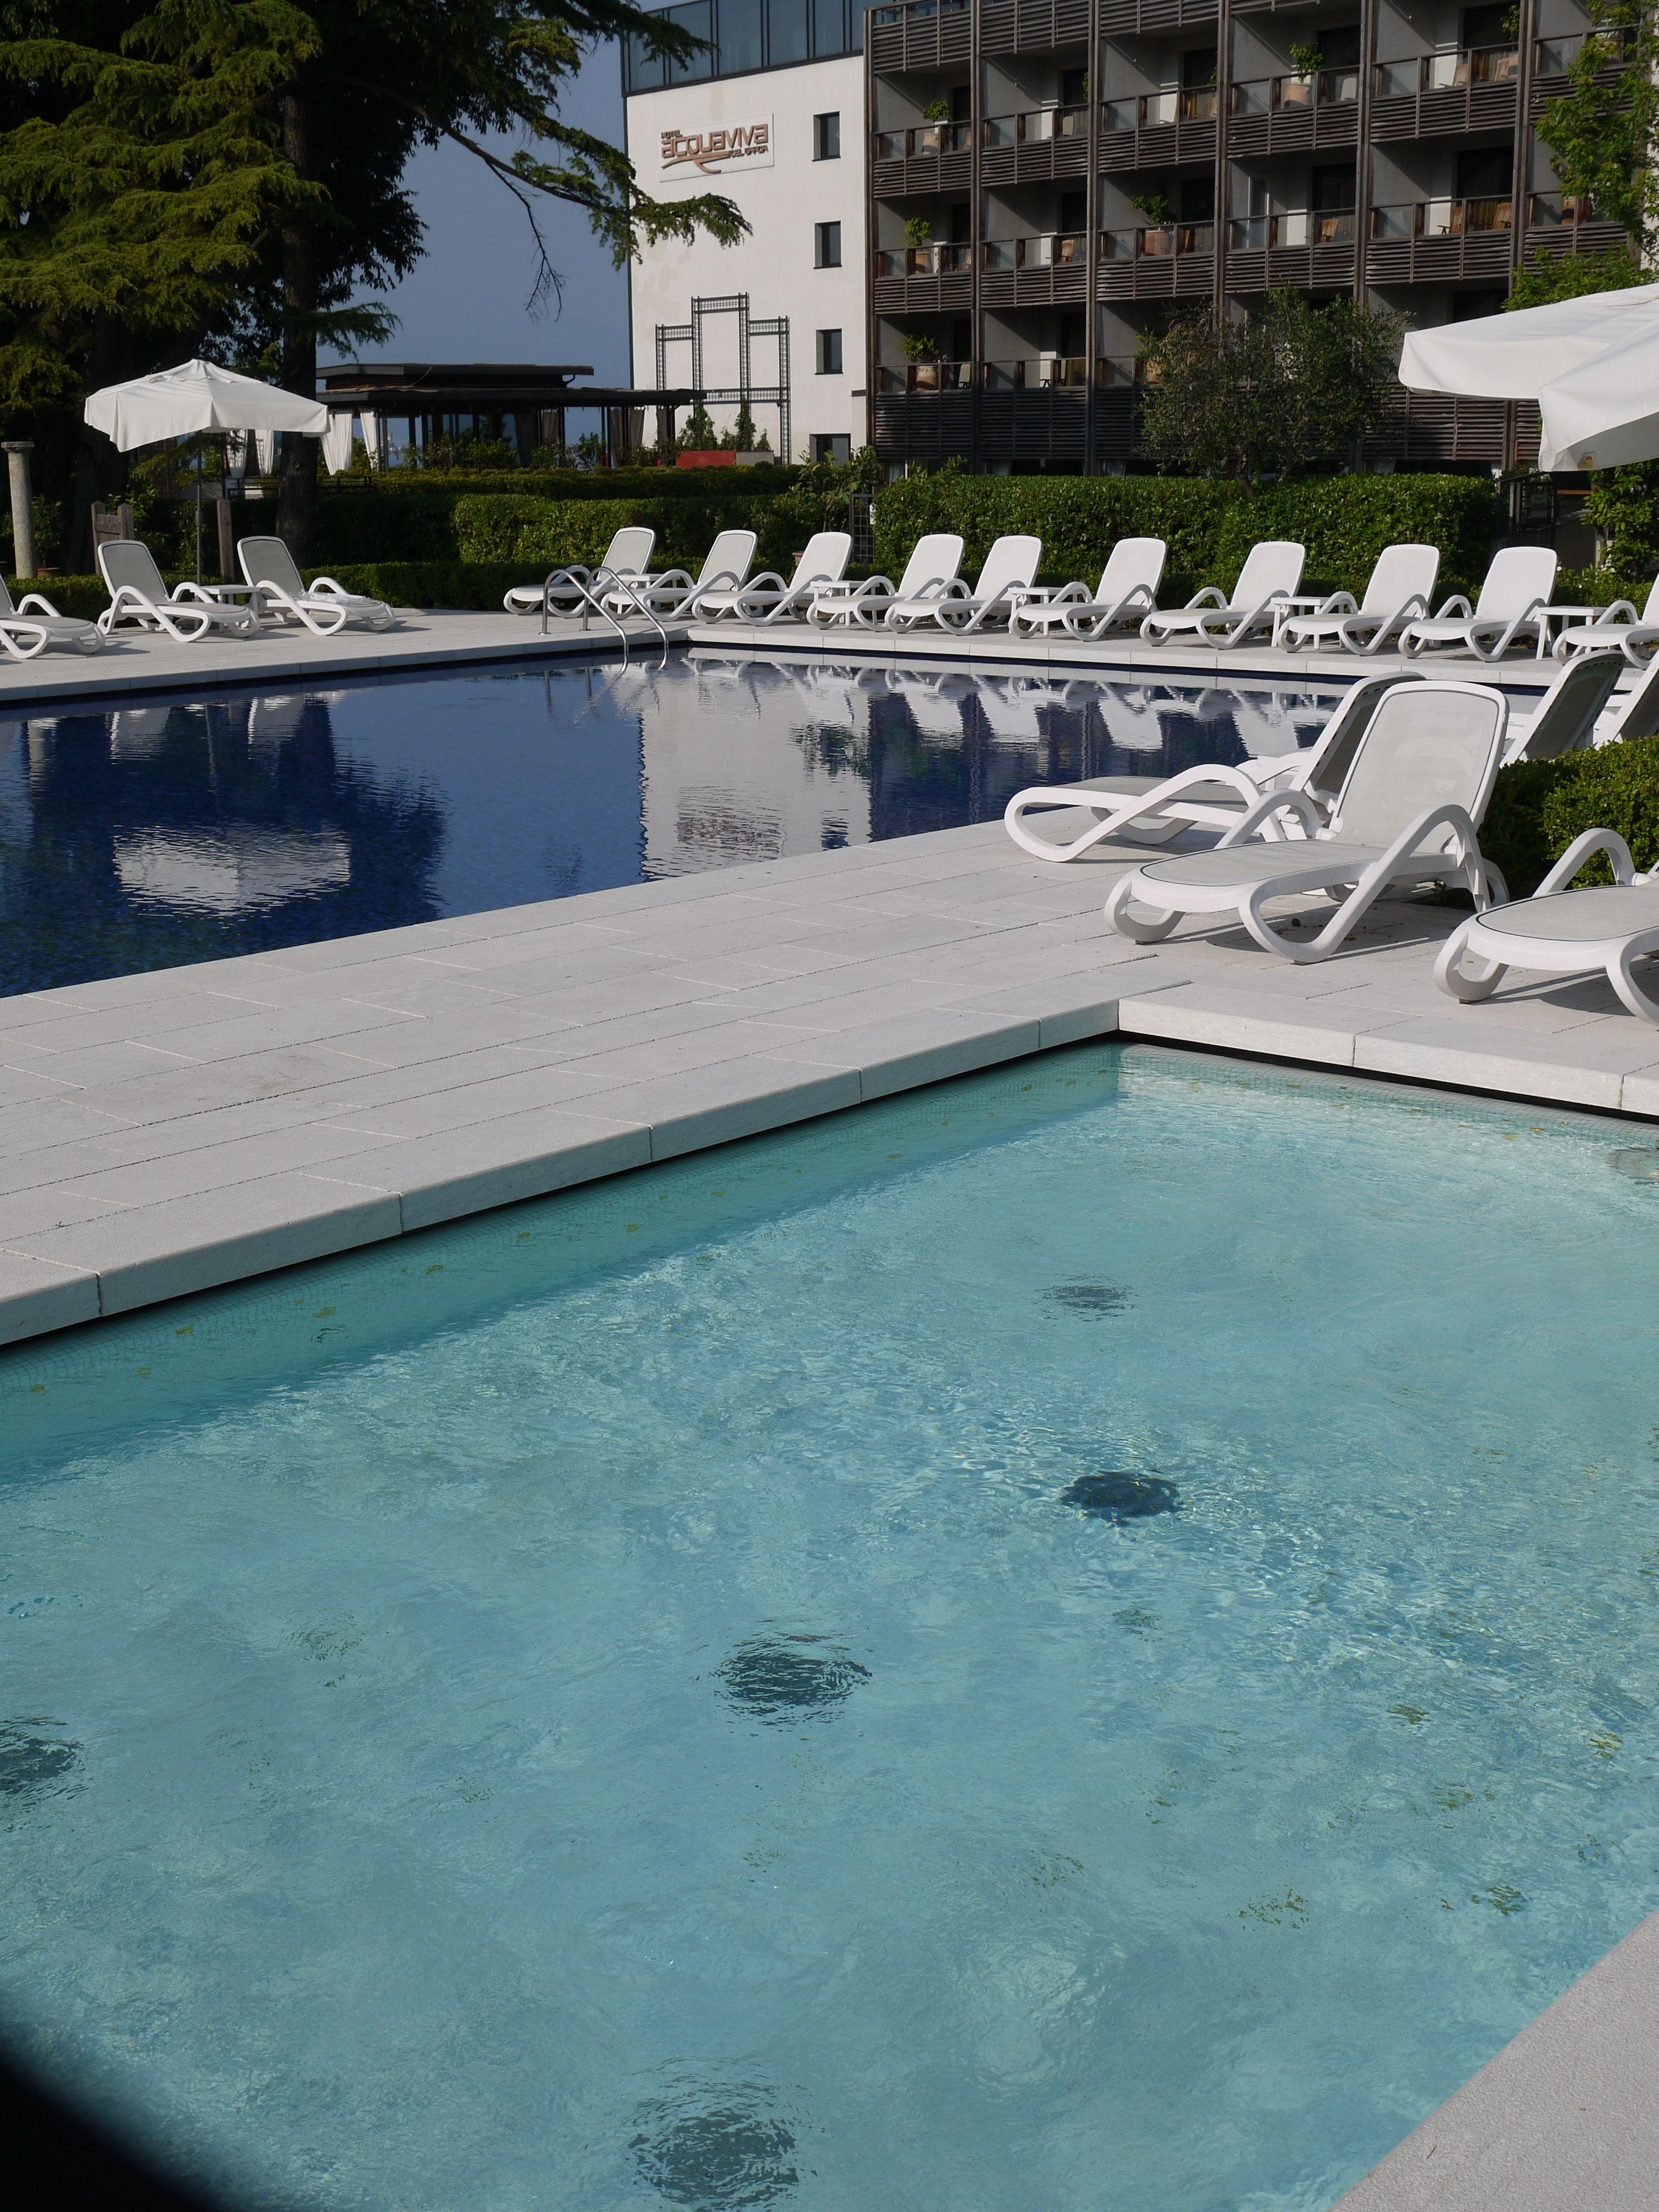 Hotel Acquaviva Wellness, Resort & Spa has two comfortable